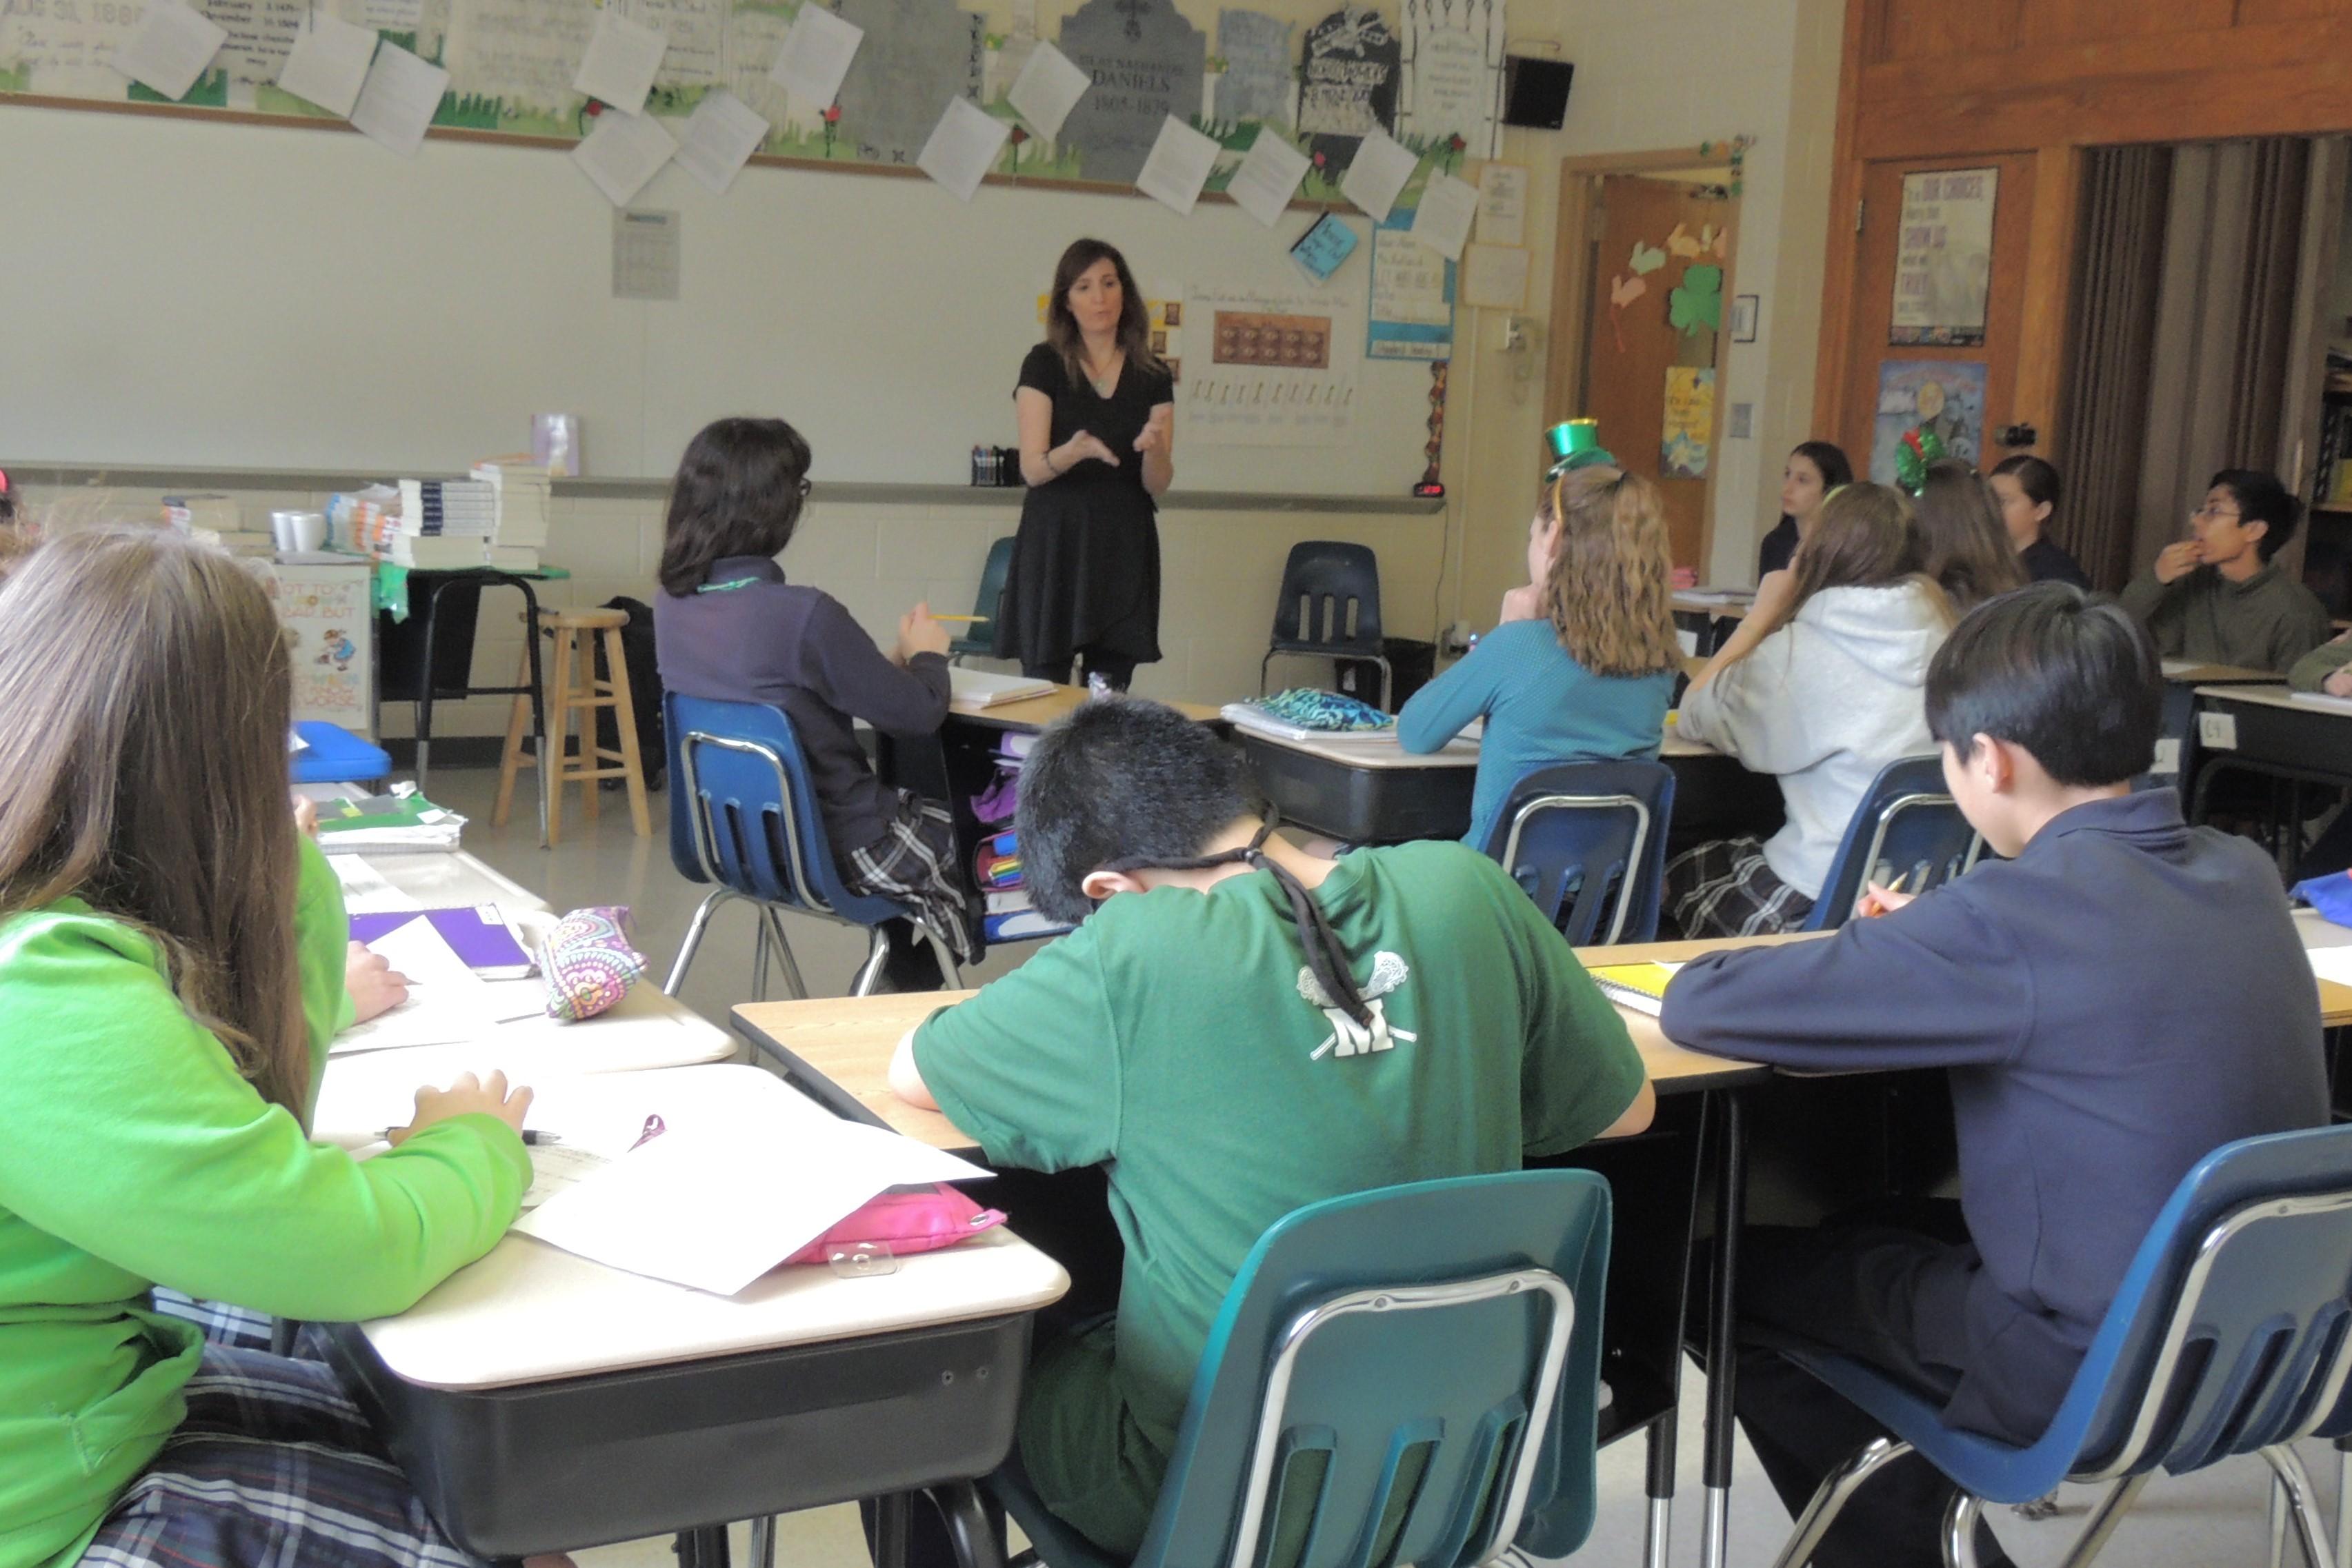 teaching high school creative writing class